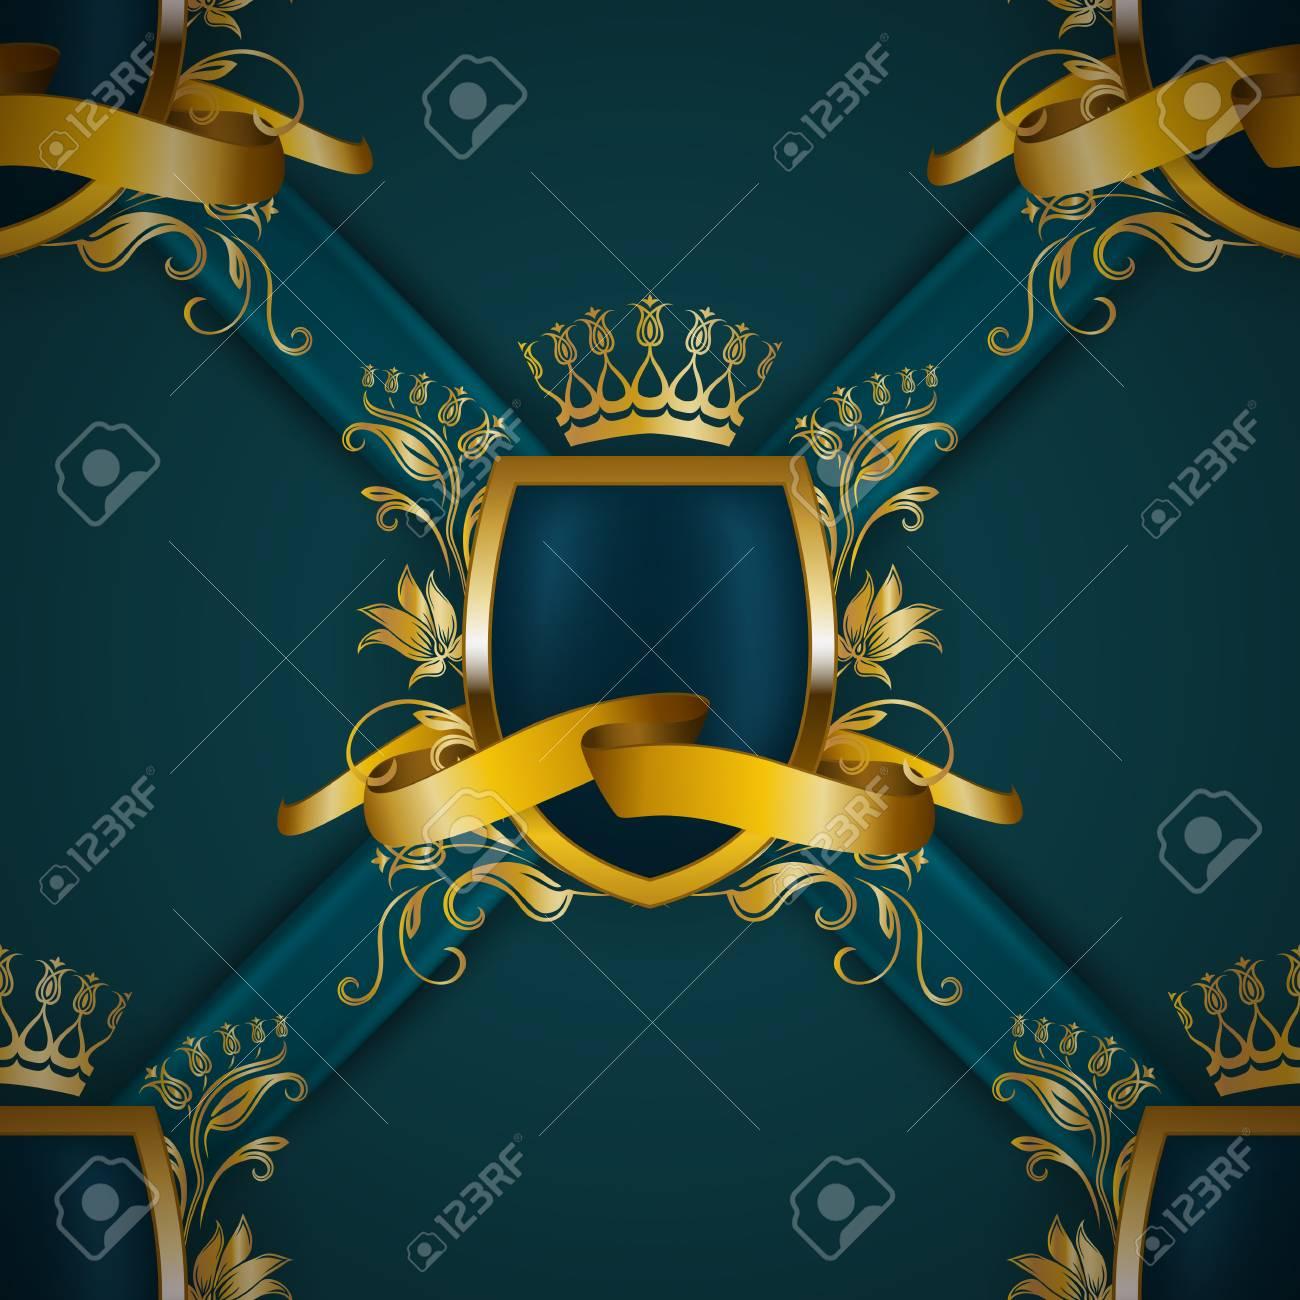 Golden royal shield with floral elements, ribbons, damask ornament on background for site, web design. Old frame, border, crown, realistic seamless pattern in vintage style for label, emblem, badge, logo - 97193123